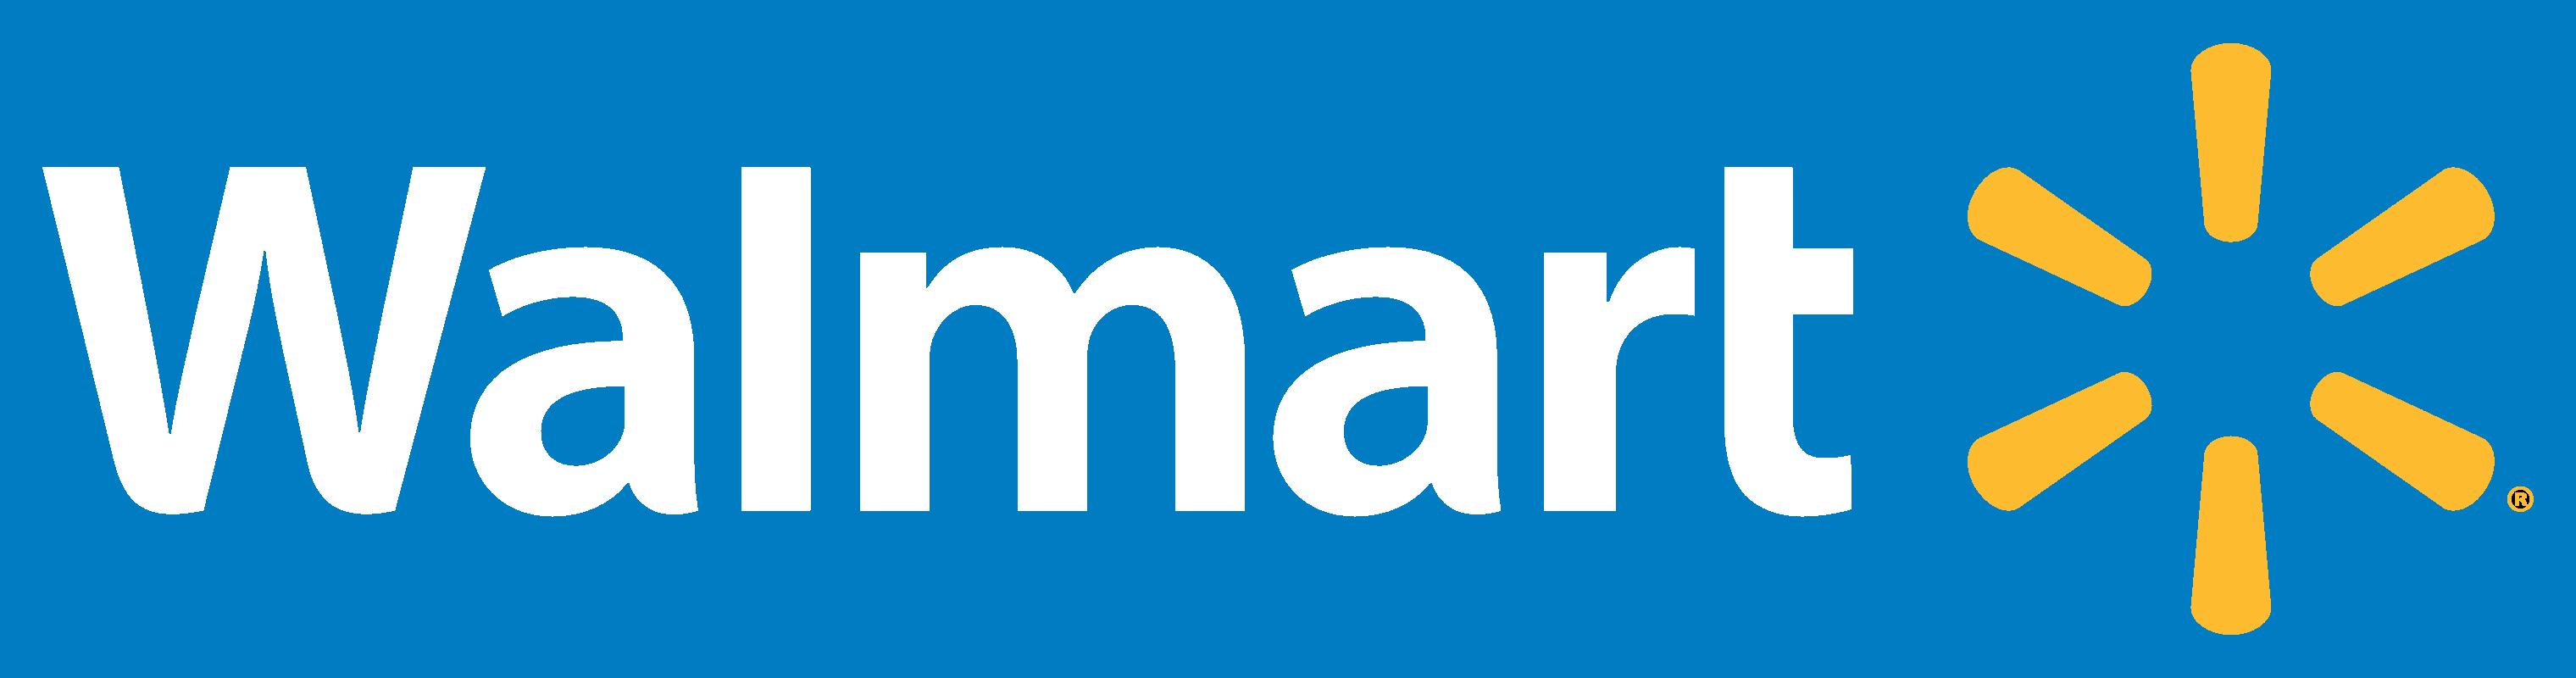 Walmart BR